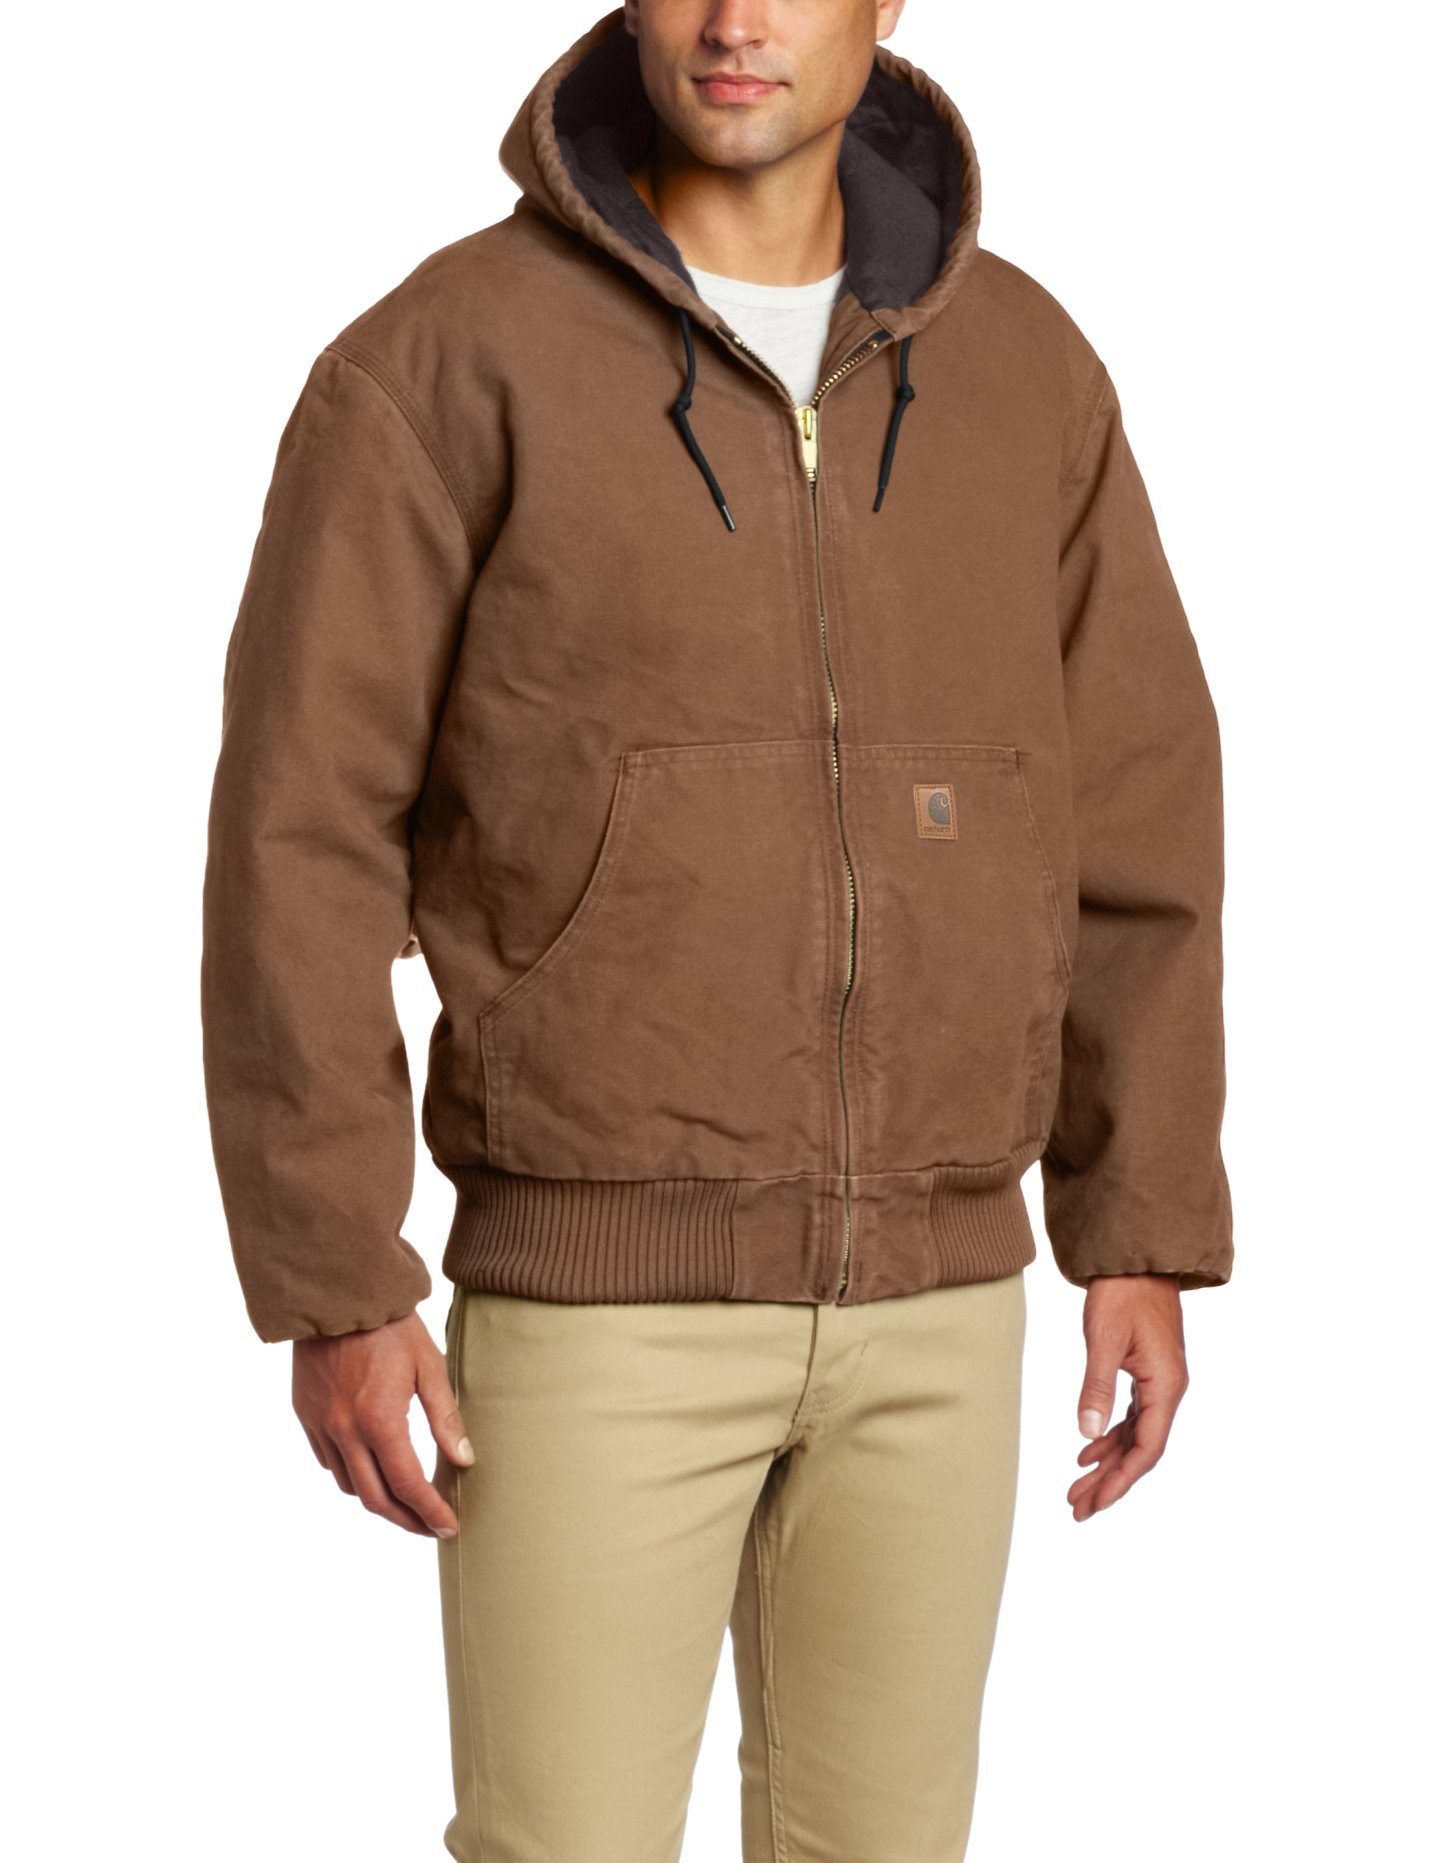 Carhartt Men's Sandstone Active Jacket,Brown  (Closeout),Medium